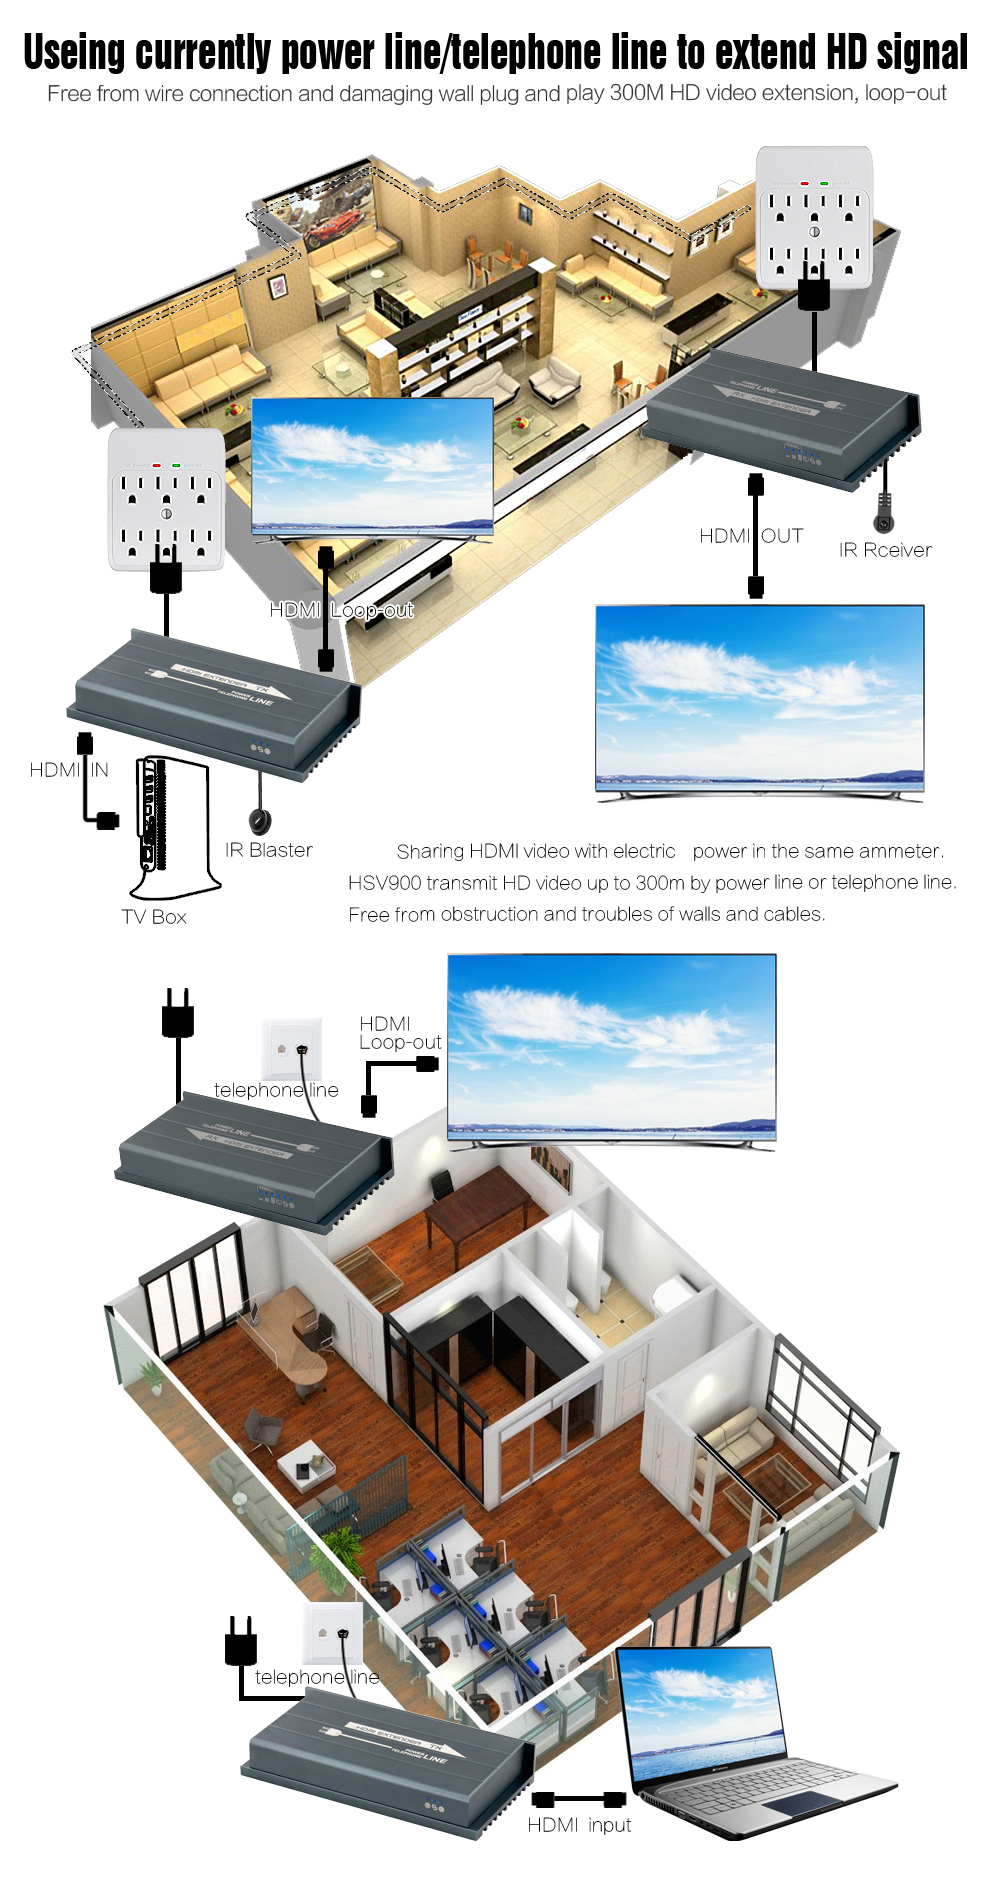 mirabox 300m hdmi extender ir over powerline or telephone line 1080p plc hdmi over powerline extender  [ 990 x 1882 Pixel ]